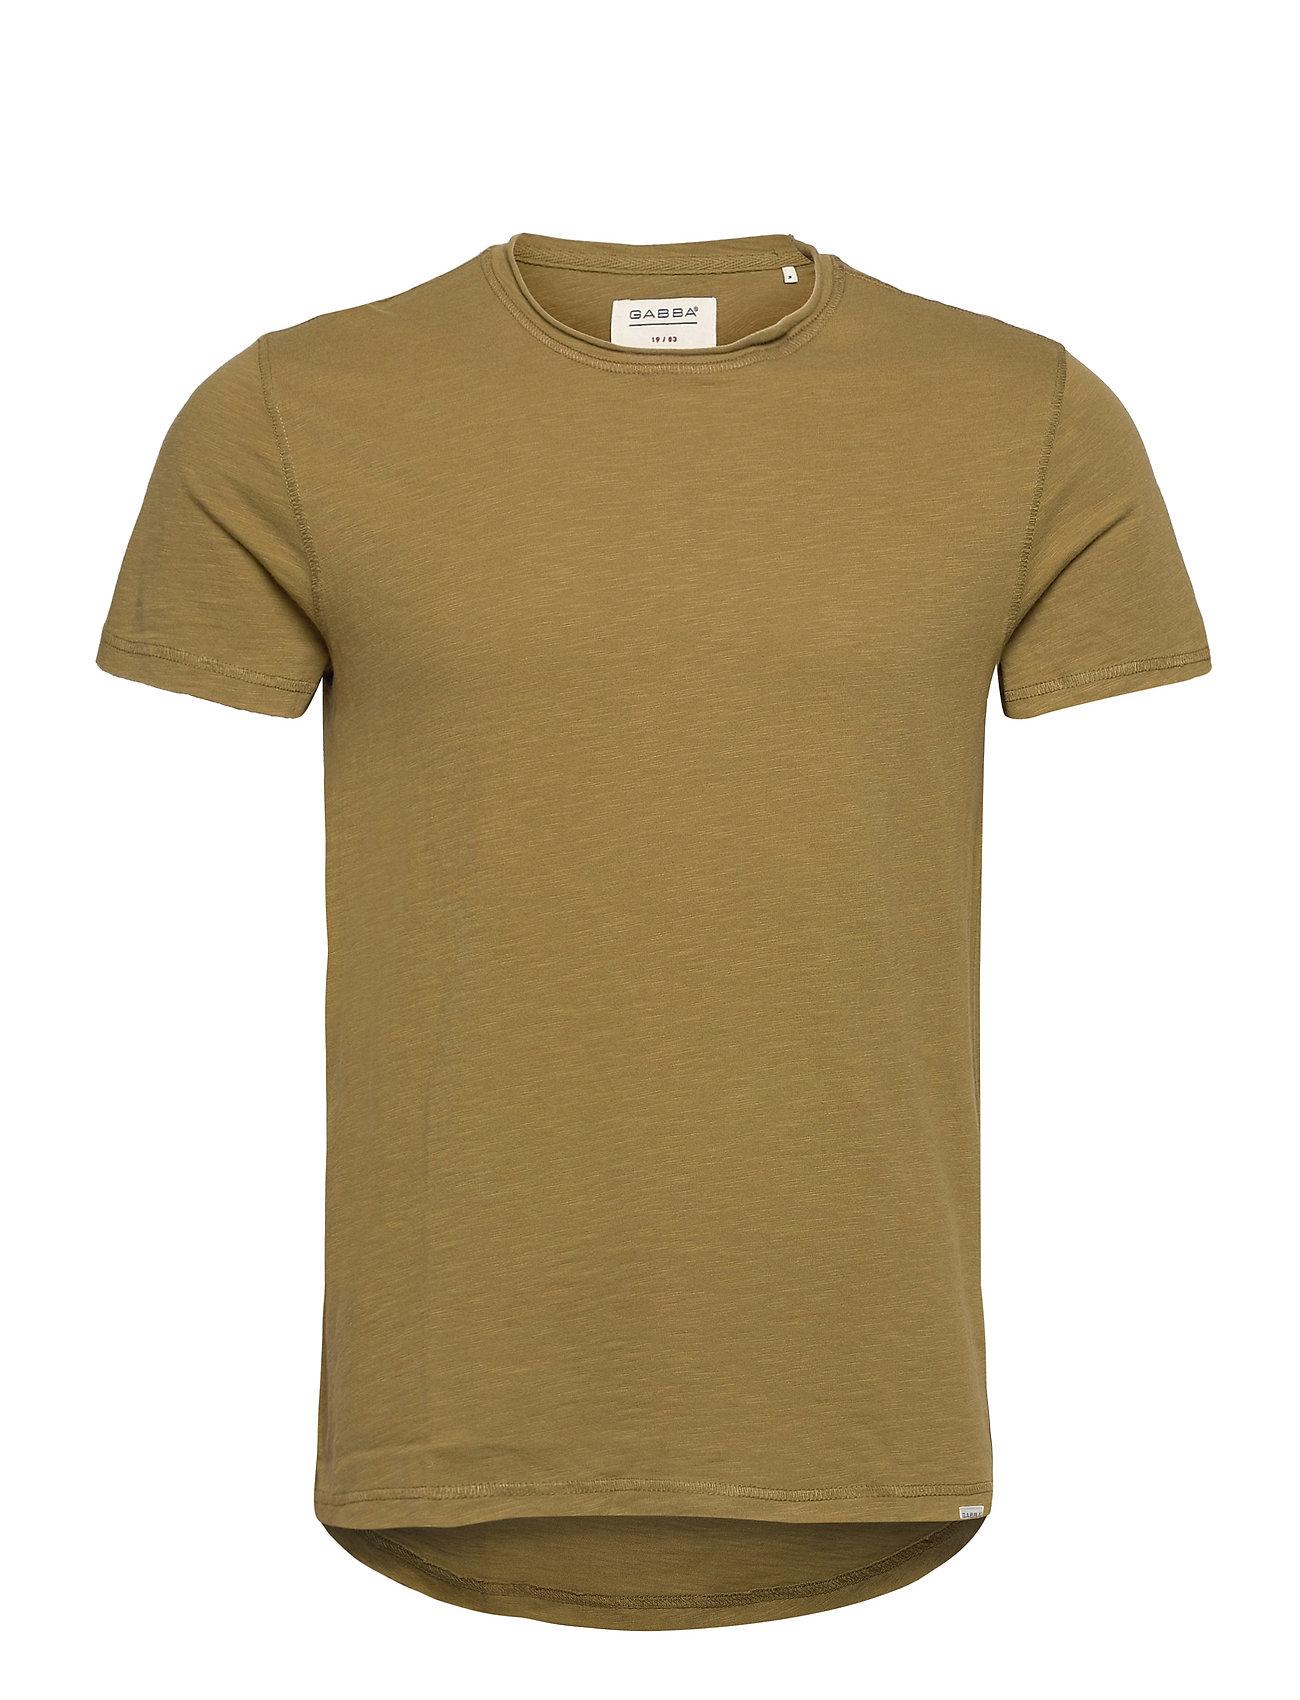 Image of Konrad Slub S/S Tee T-shirt Grøn Gabba (3552280413)